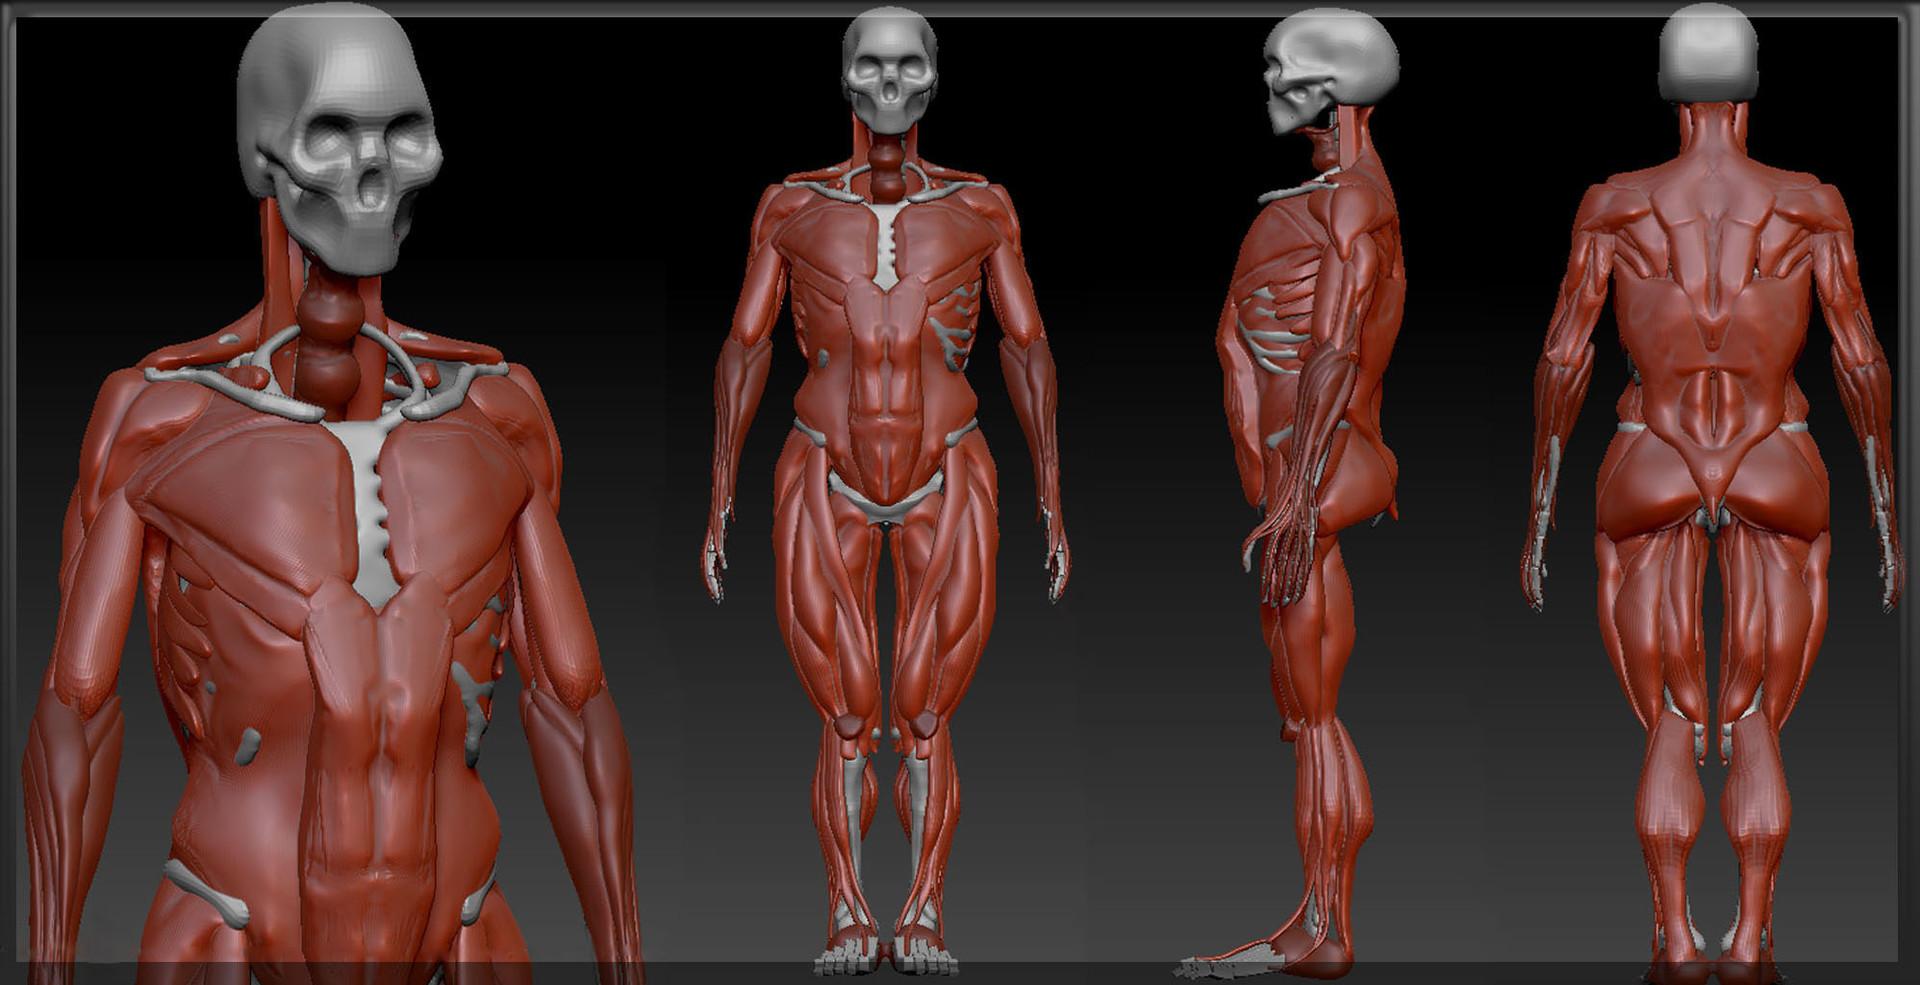 roozbeh iravani - Anatomy studies